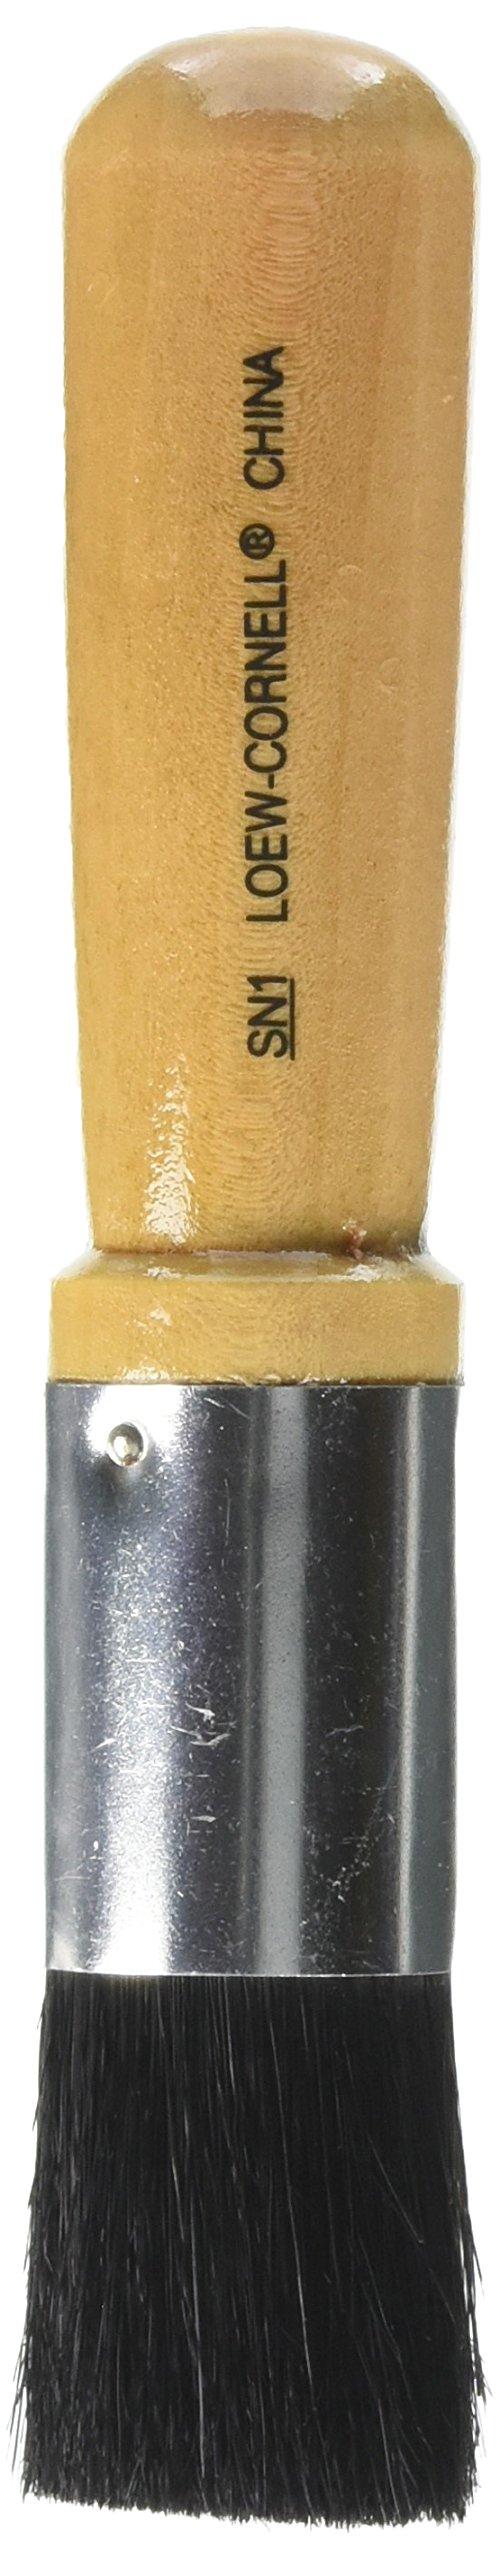 Loew-Cornell Bristle Stencil Brush-1'' by Loew-Cornell